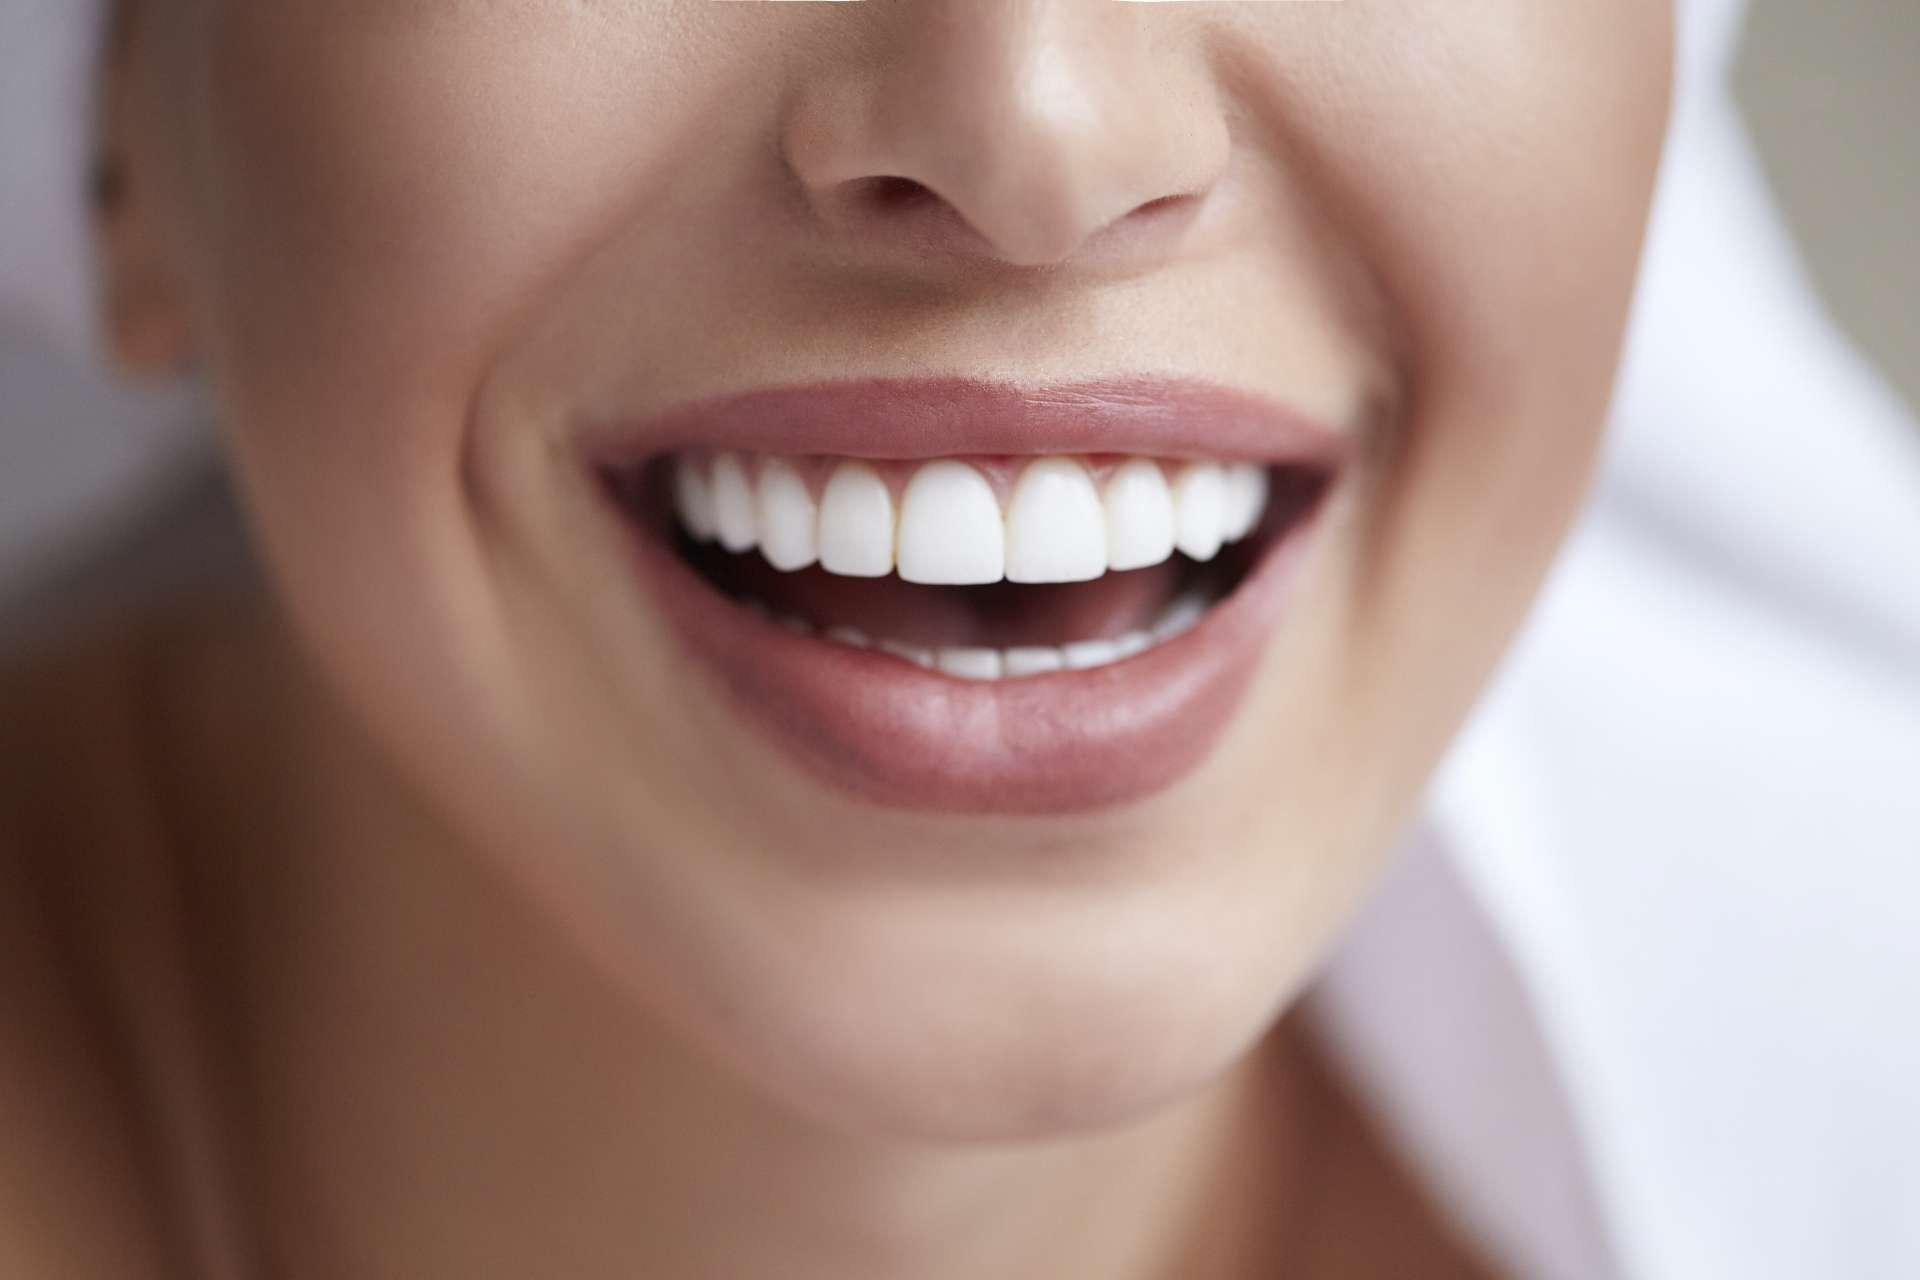 Close-up woman's smiling mouth - Teeth Whitening New York, Teeth Whitening Manhattan